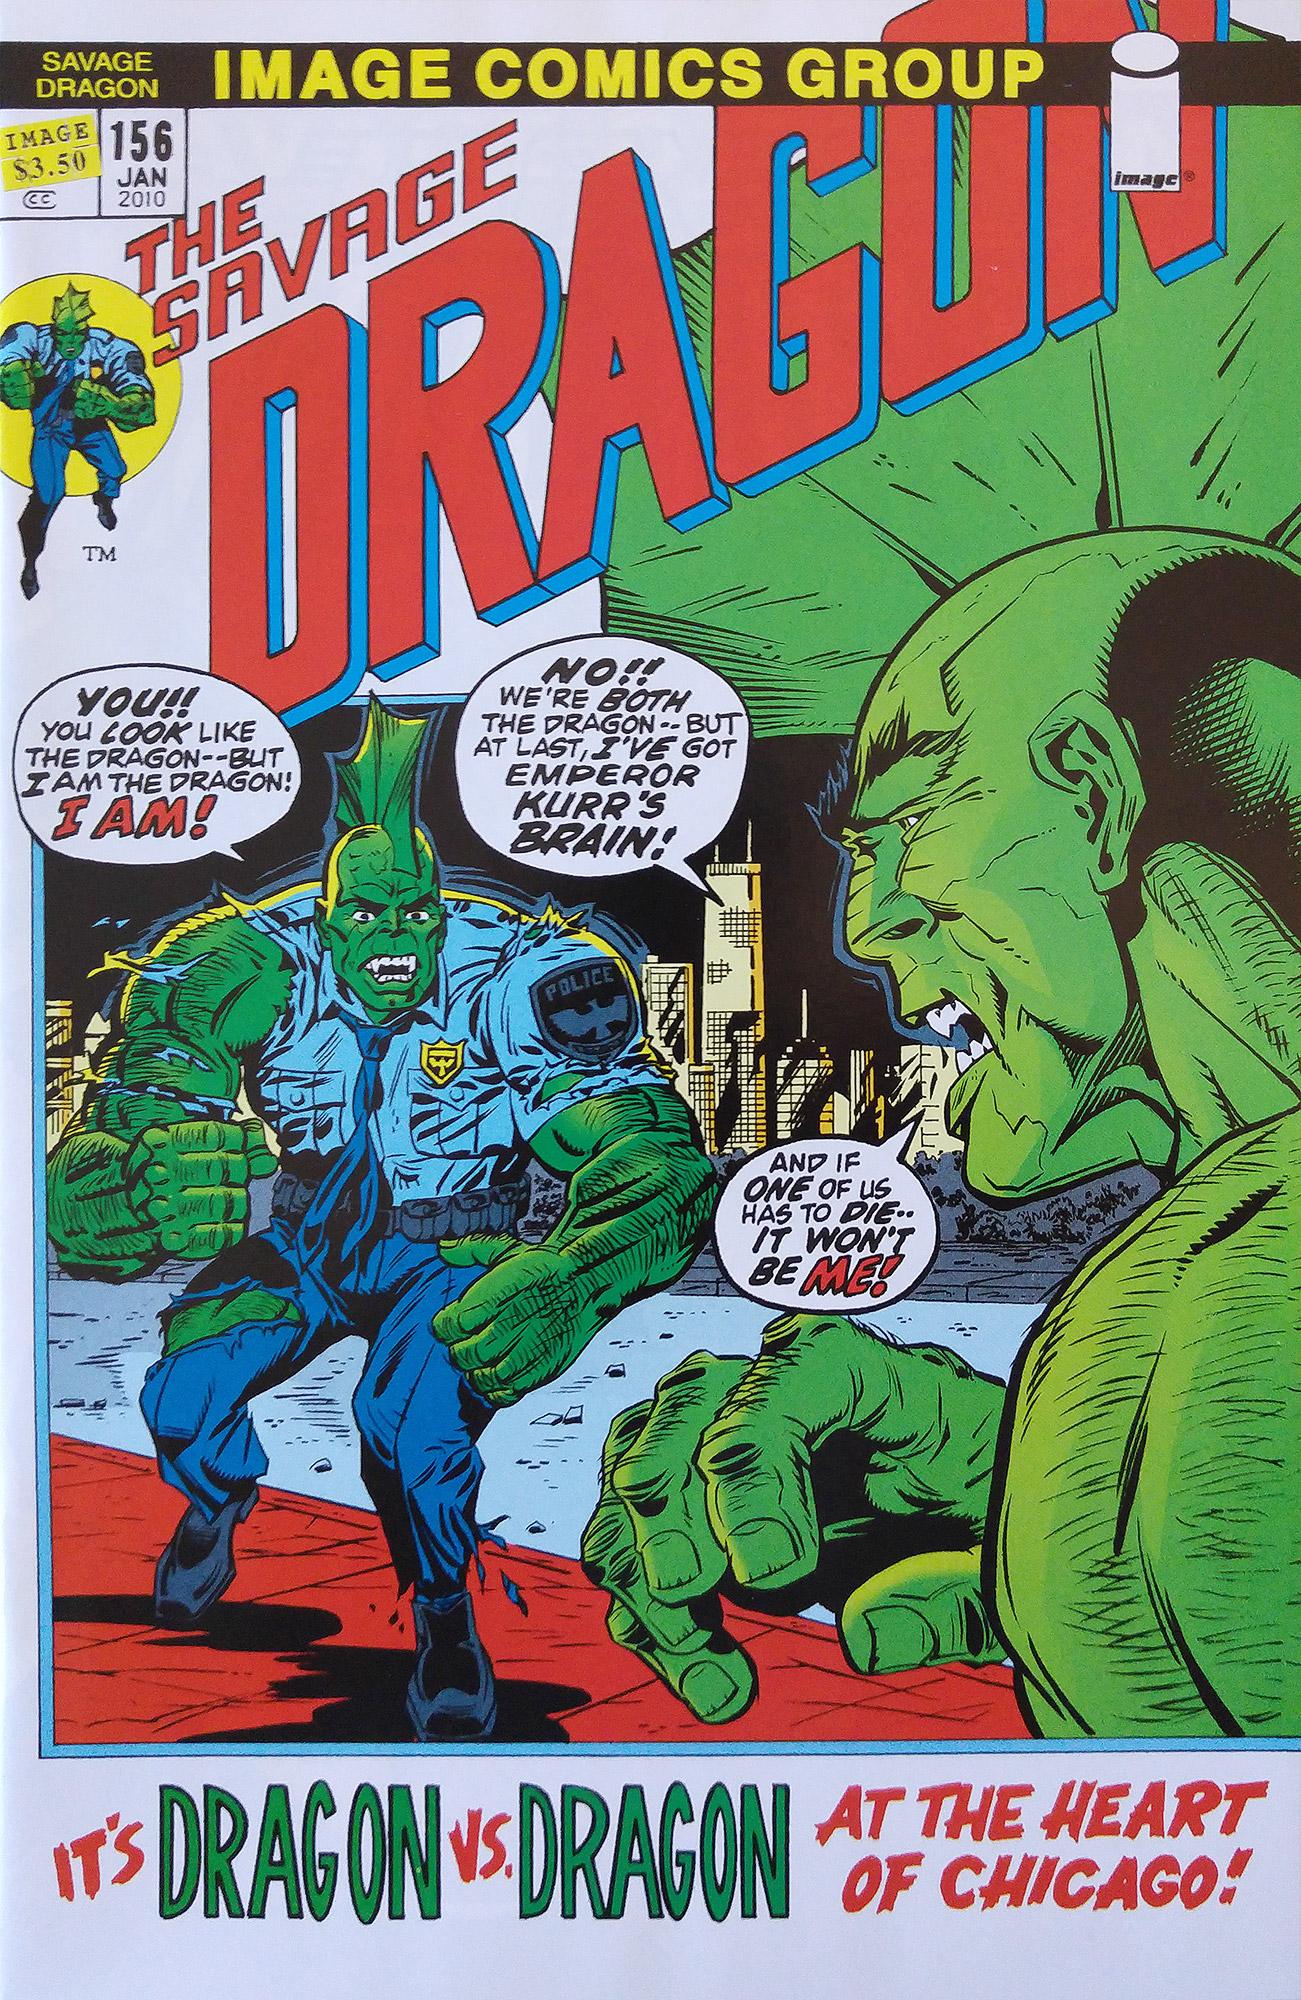 Cover Savage Dragon Vol.2 #156 Variant